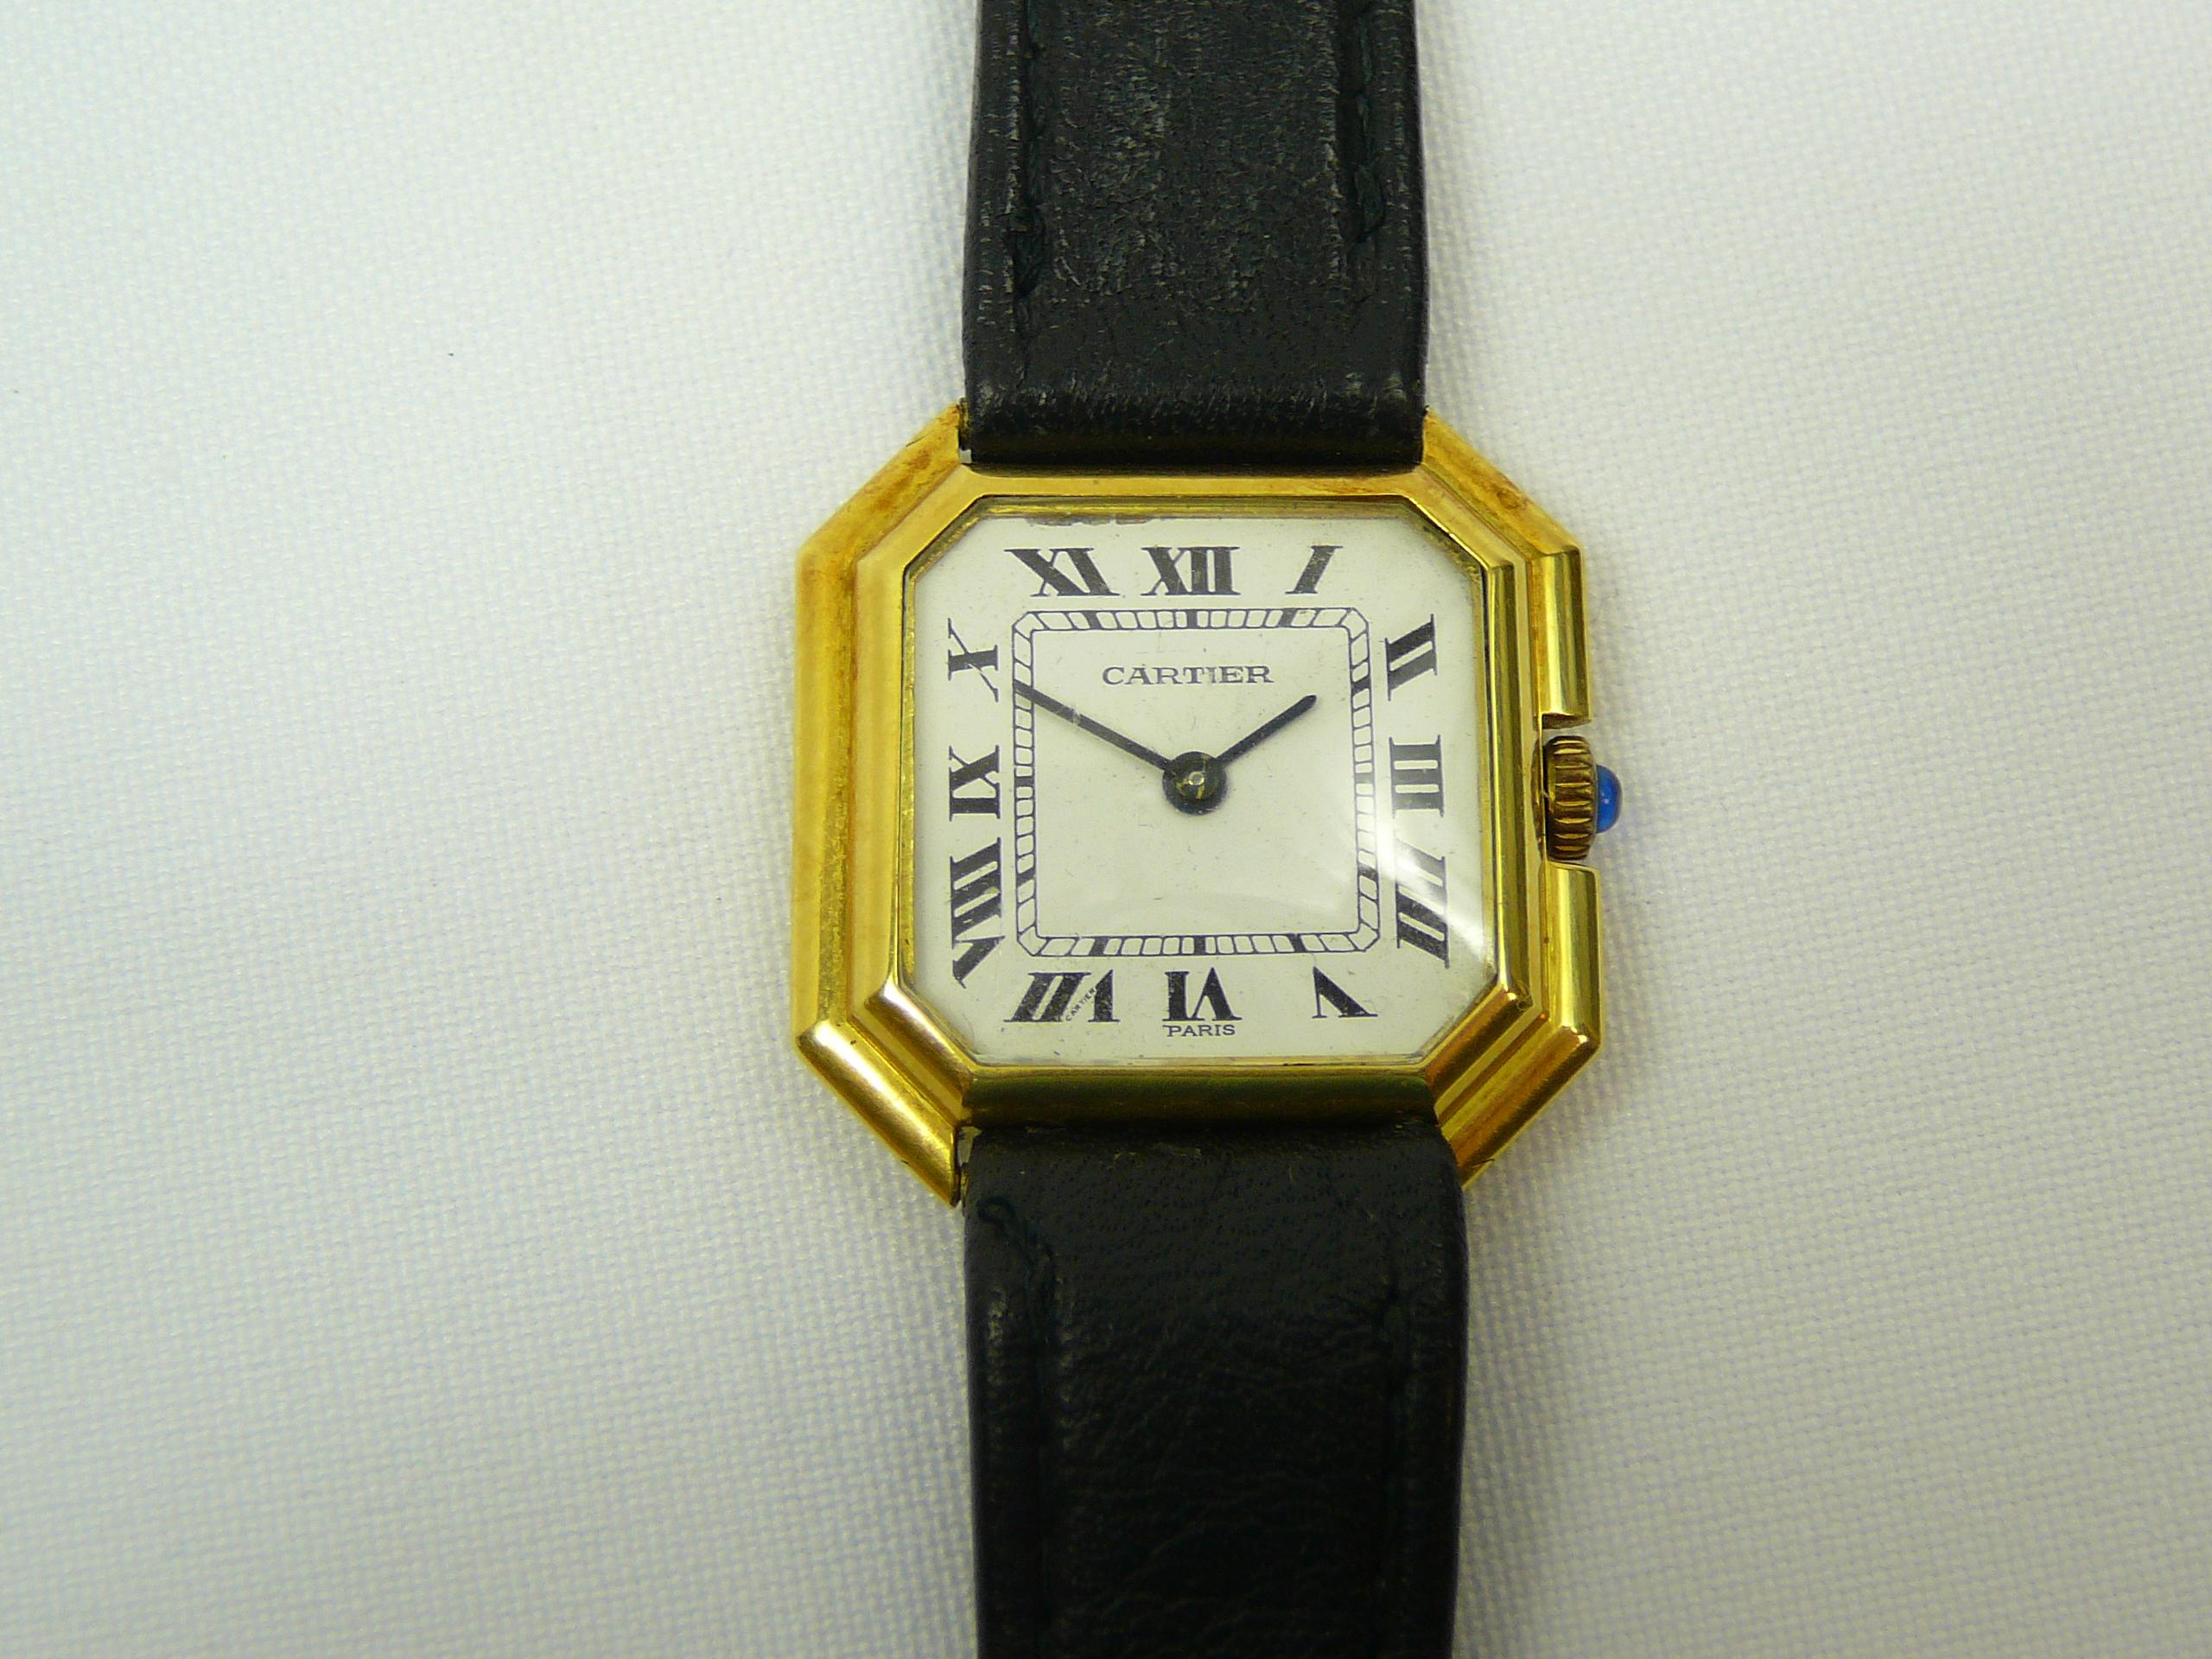 Lot 22 - Ladies gold Cartier Wrist Watch